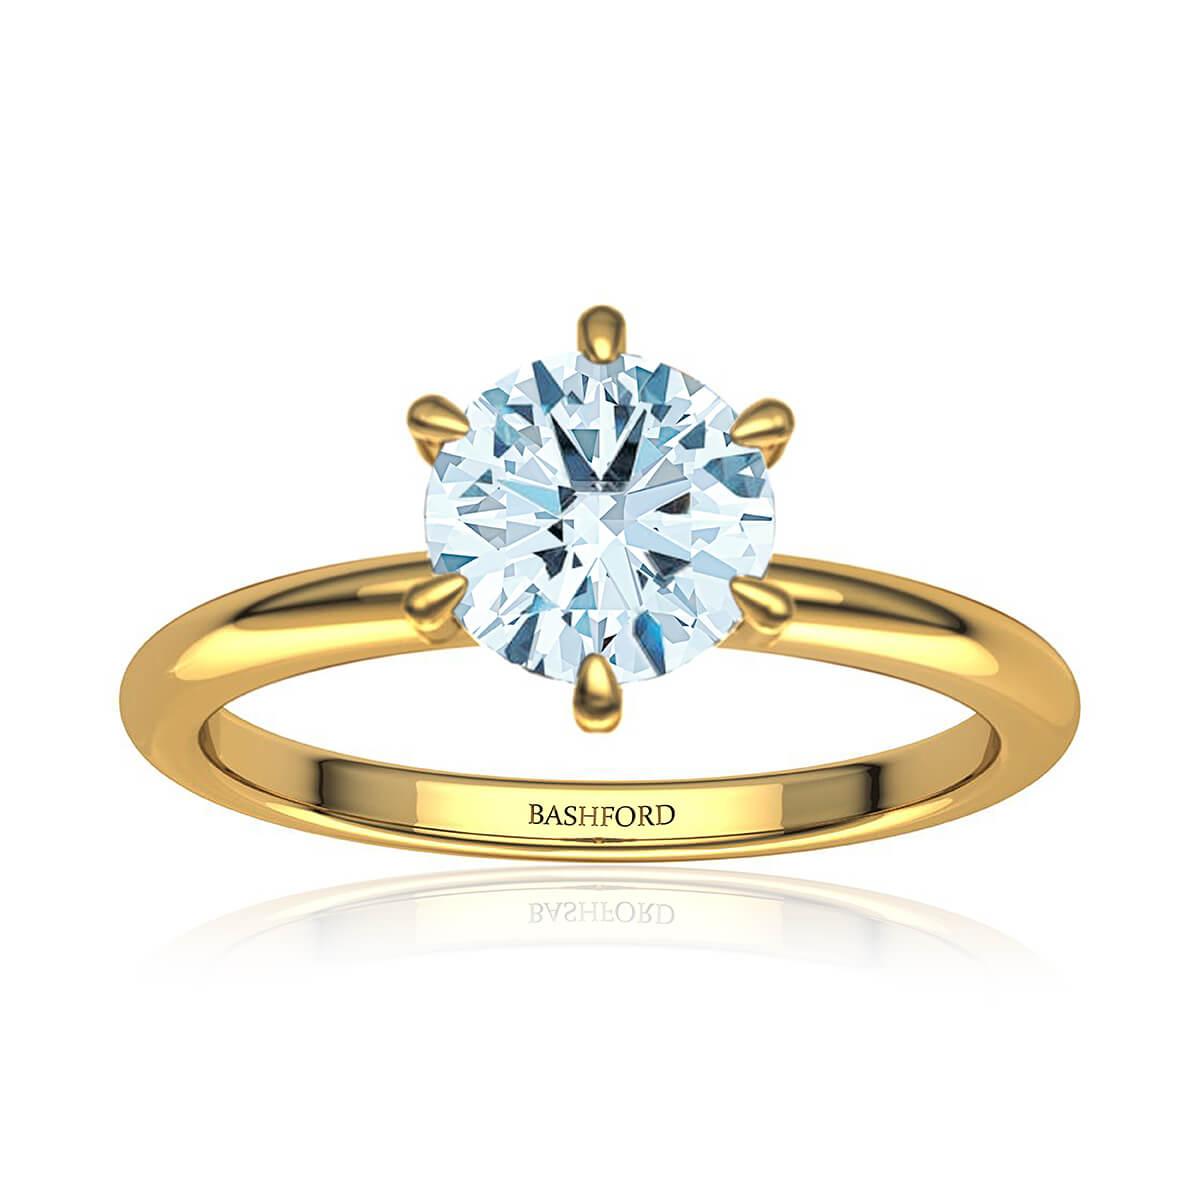 Serendipity Diamond Ring  (with VS2, G,  3/4 Carat Round Diamond)